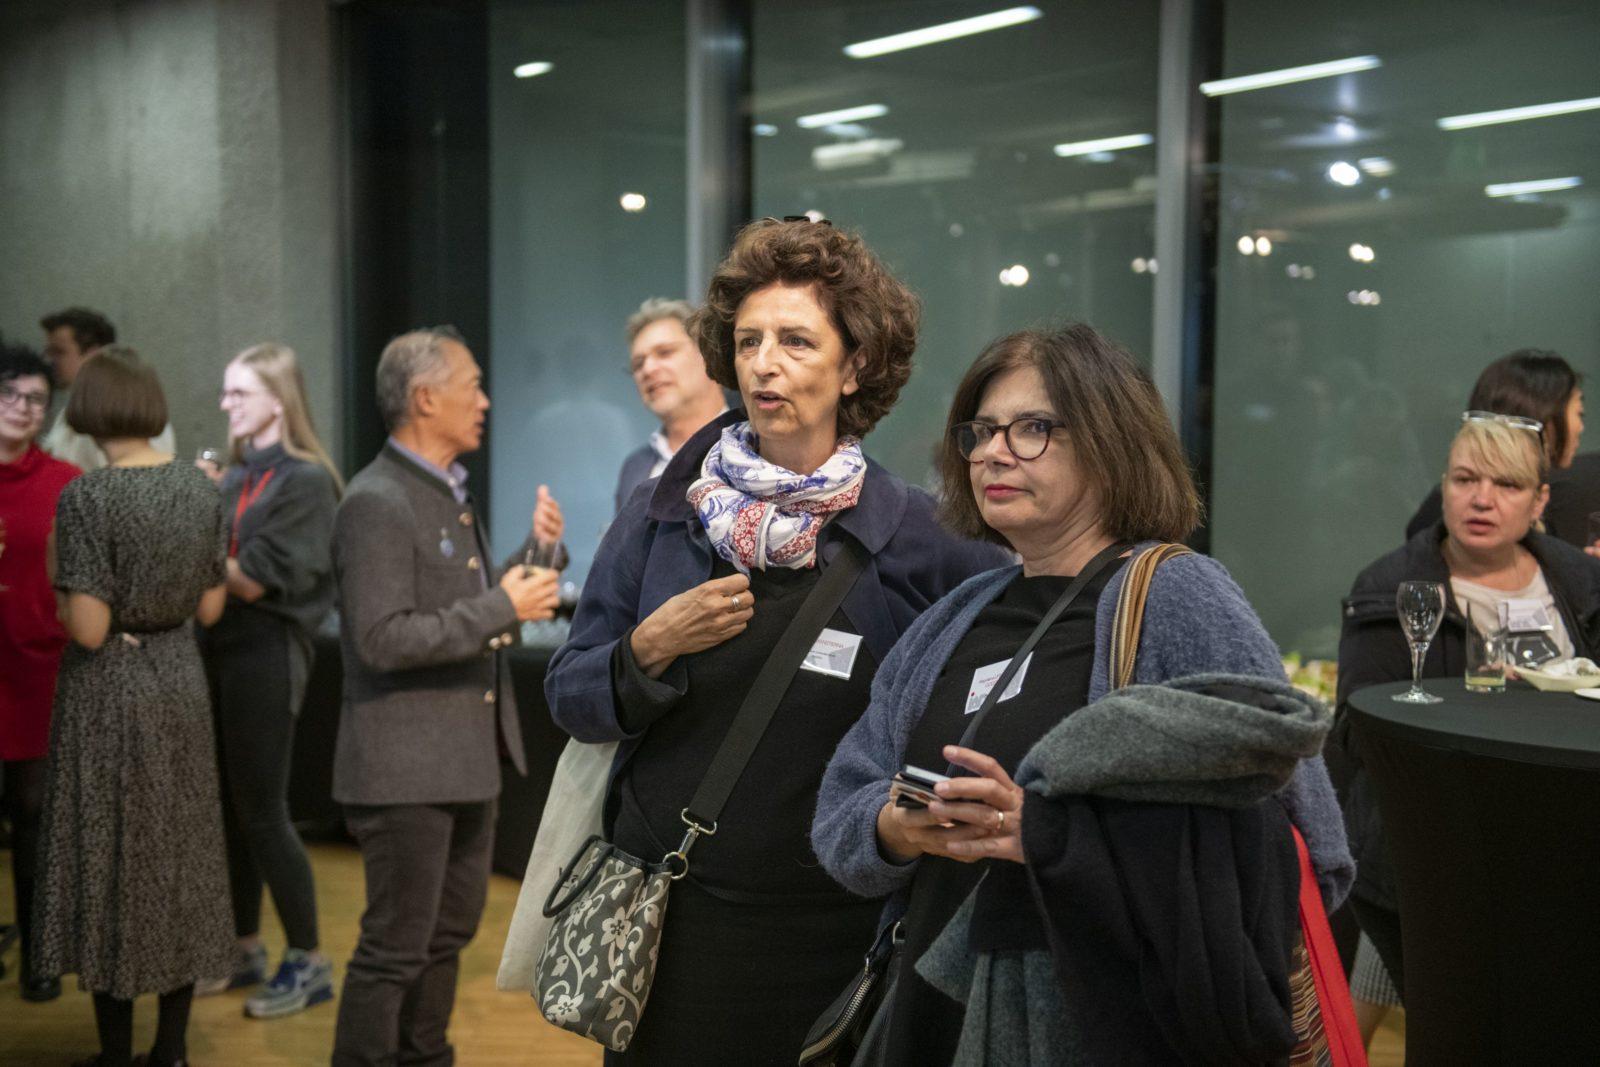 Warschau_2019_Empfang_reception_Thursday_Warsaw_Stasiuk_Konrad_128